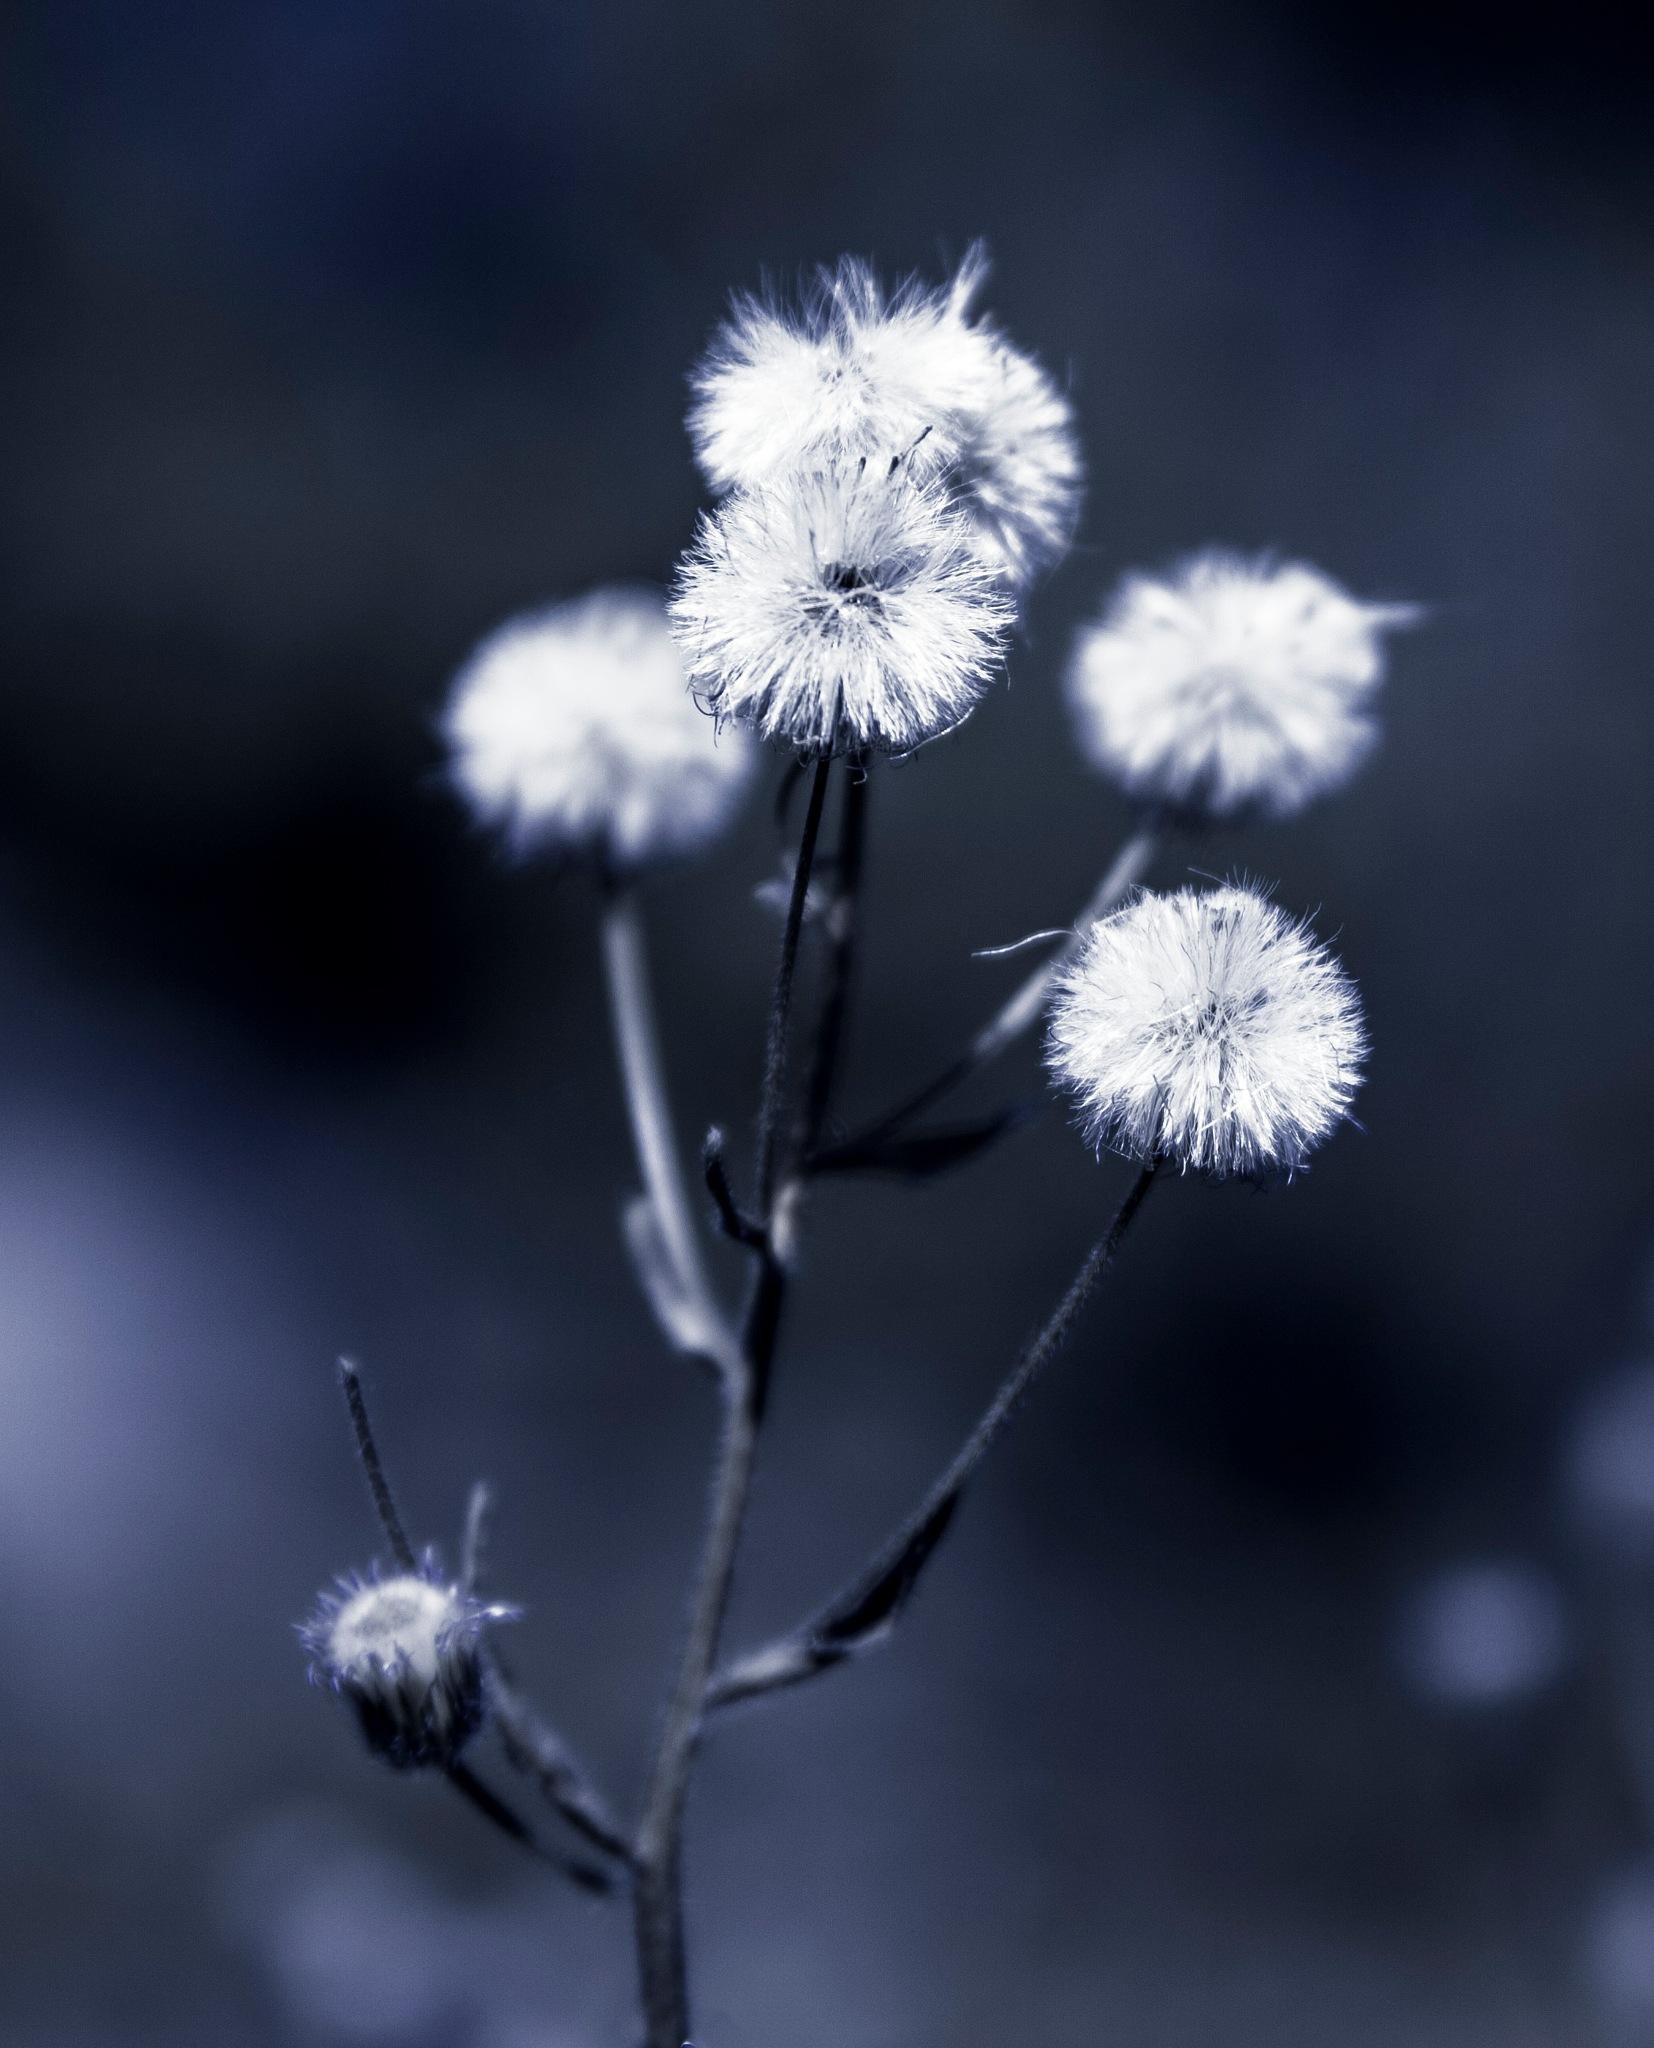 Flowers by Mattias Carlsson